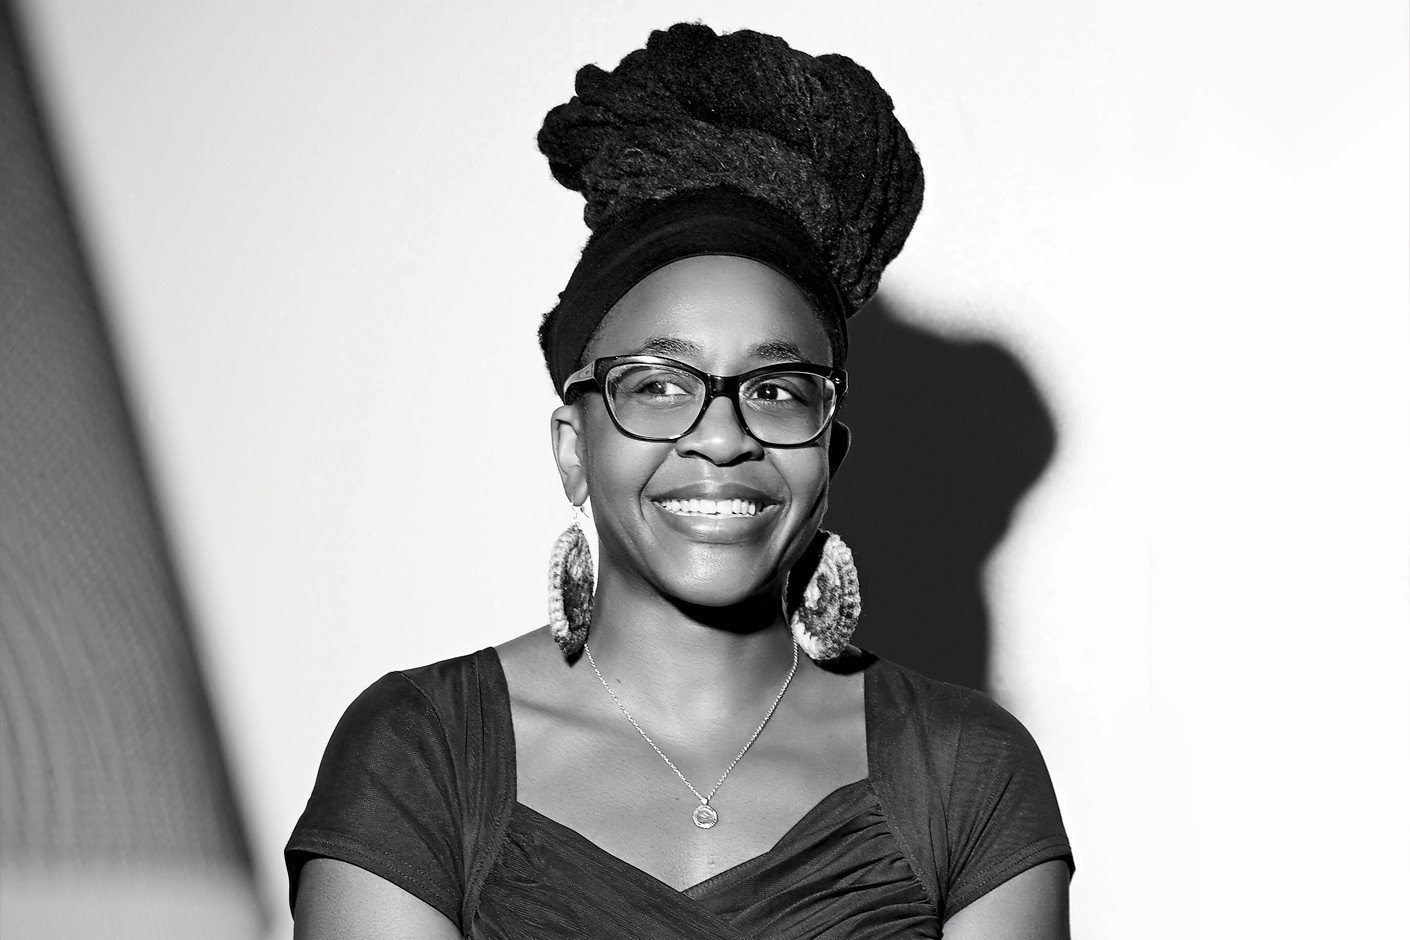 Nnedi Okorafor scénarisera le nouveau spin-off du comics «Black Panther»